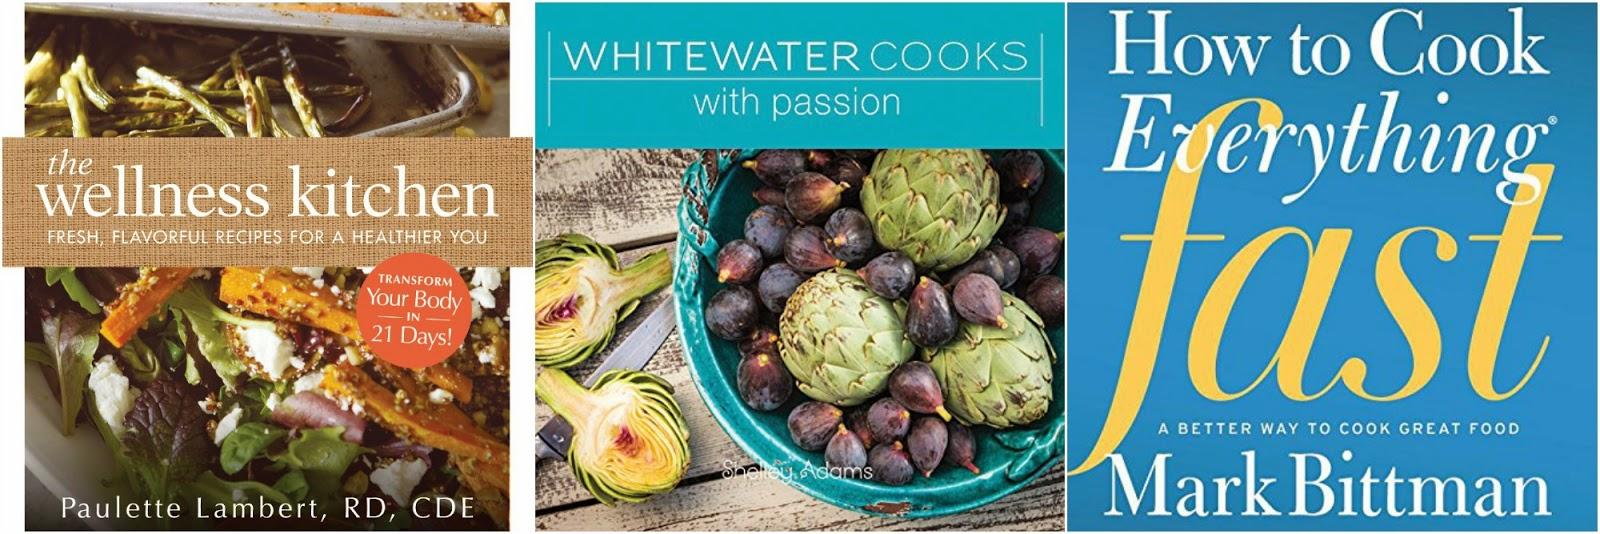 Vanilla Clouds and Lemon Drops: Cookbook Reviews